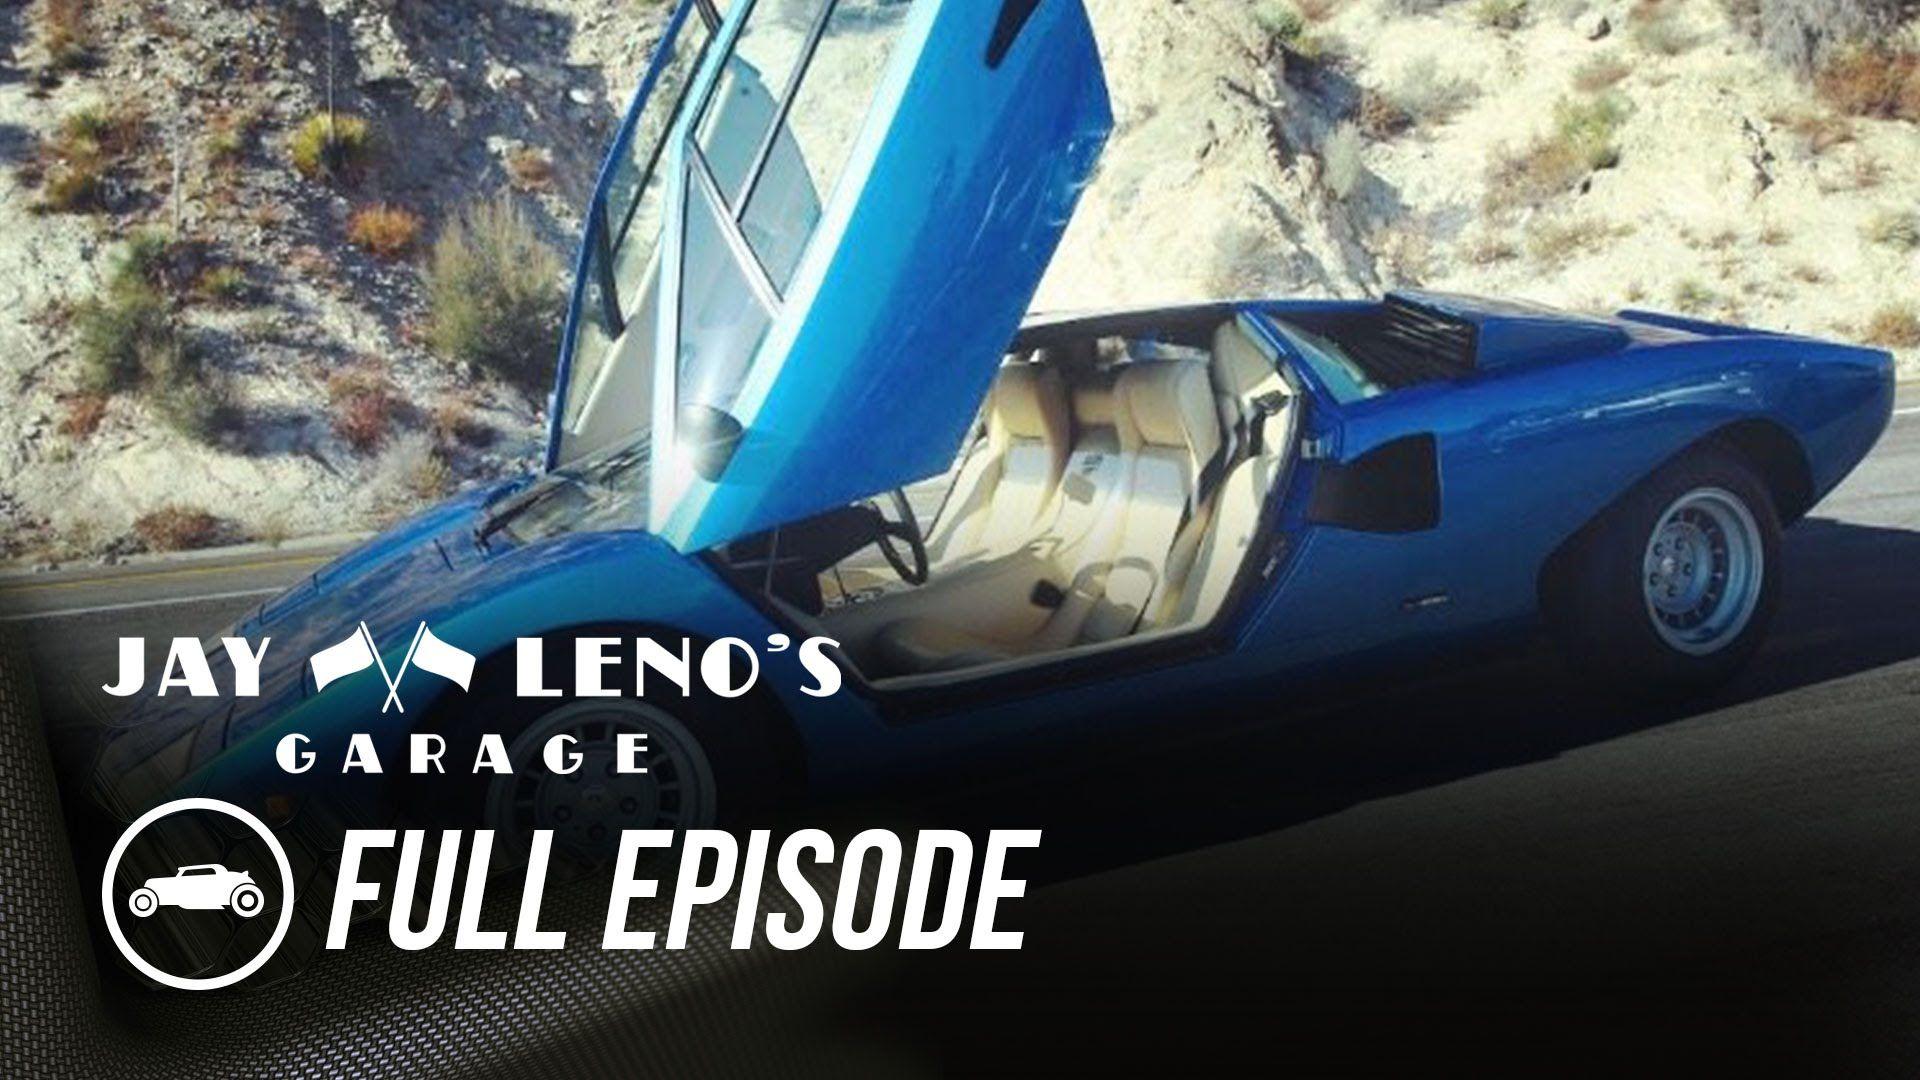 Jay lenos garage season 2 episode 2